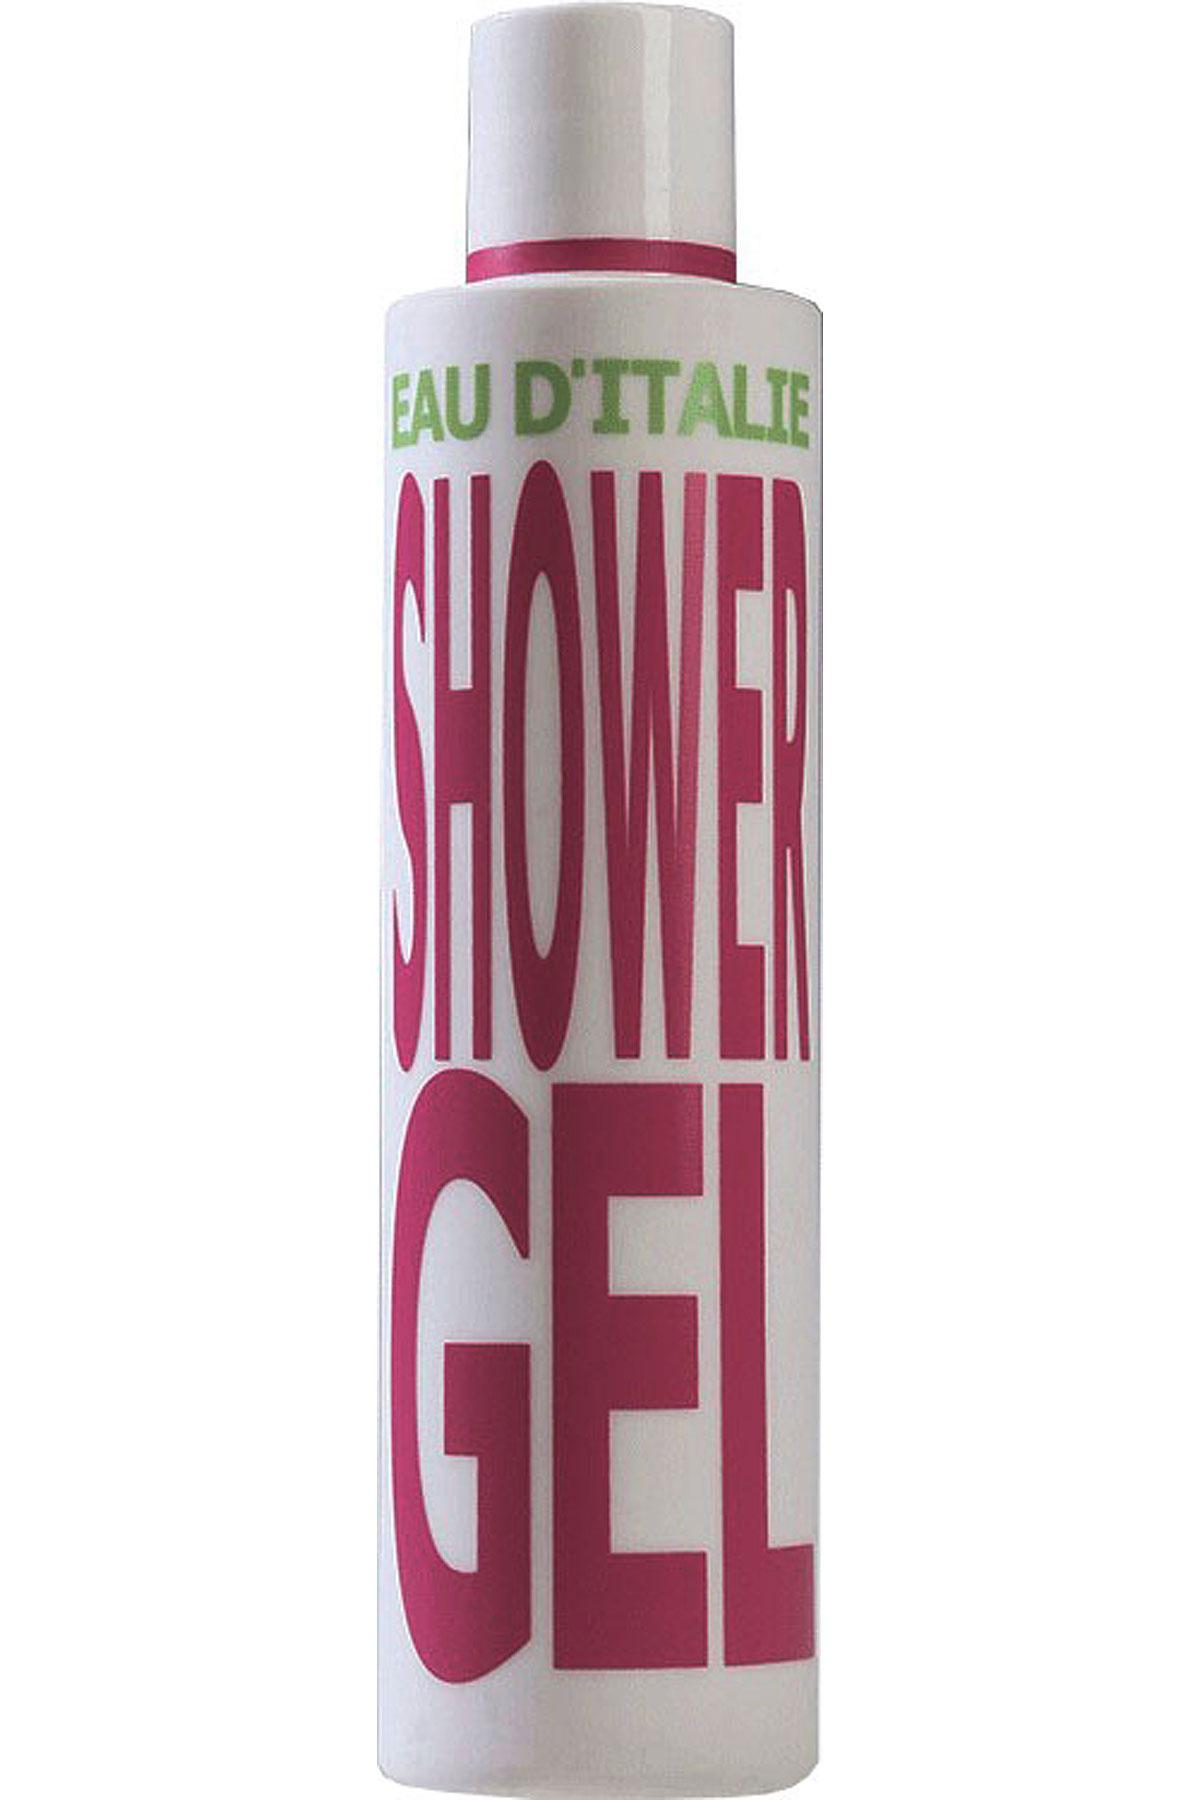 Eau D Italie Beauty for Men, Eau D Italie - Shower Gel - 200 Ml, 2019, 200 ml